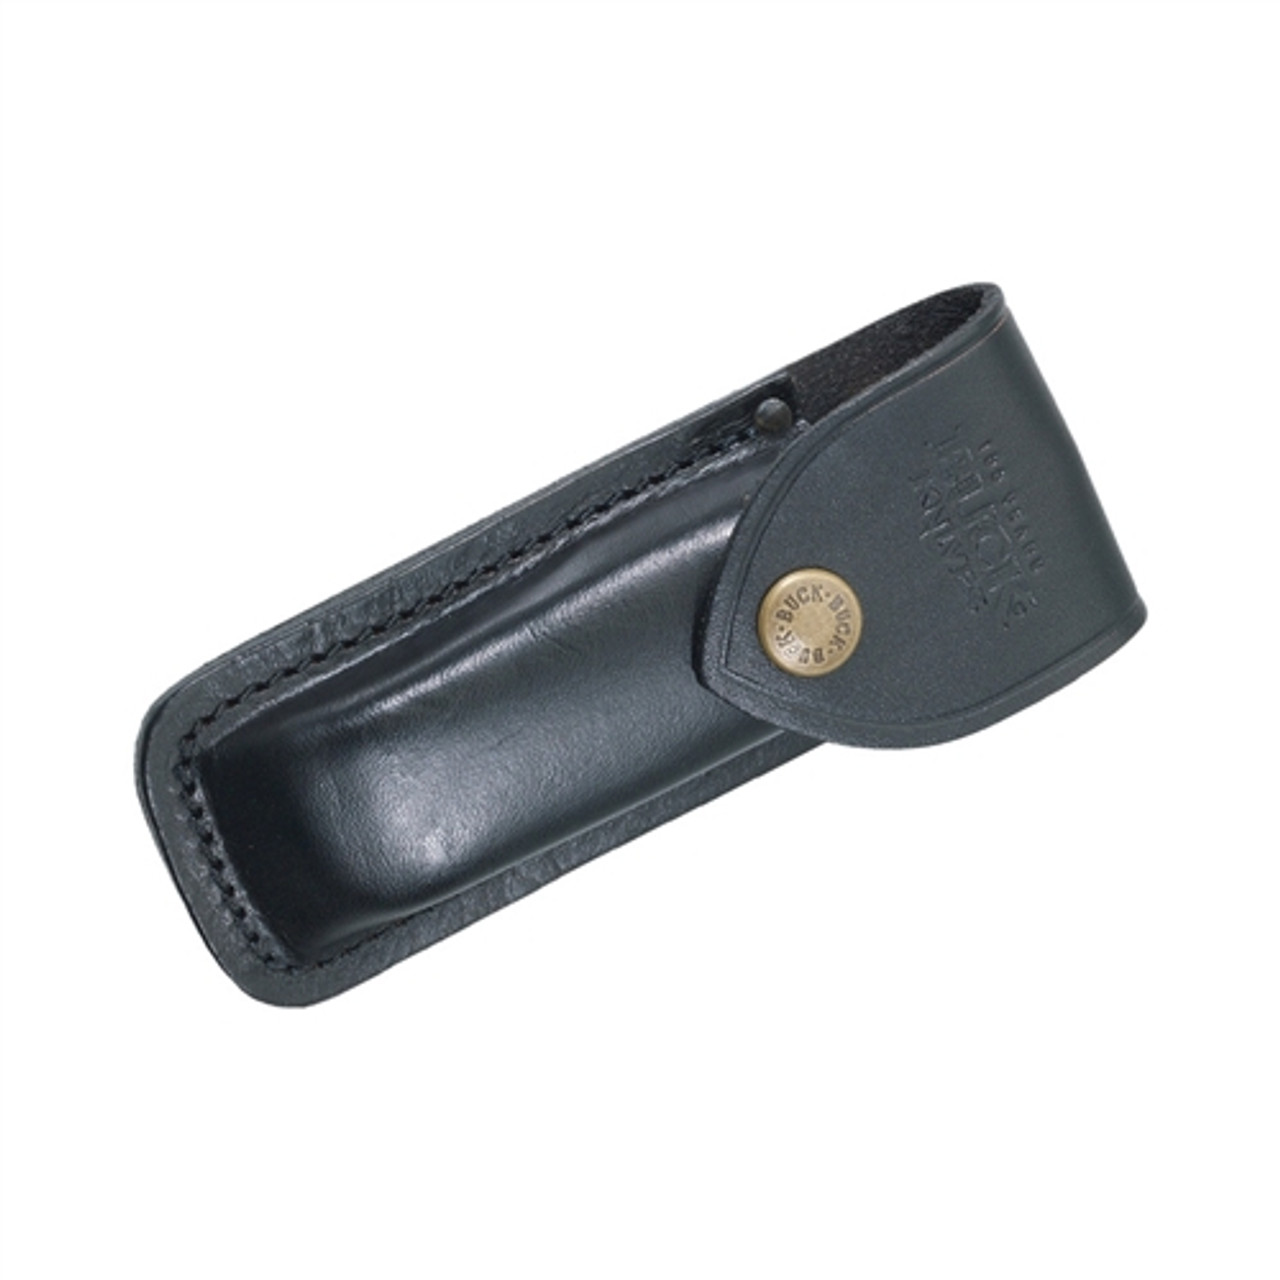 Buck 0110BRS 110 Hunter Dymondwood/Brass Folder Knife, Satin Blade